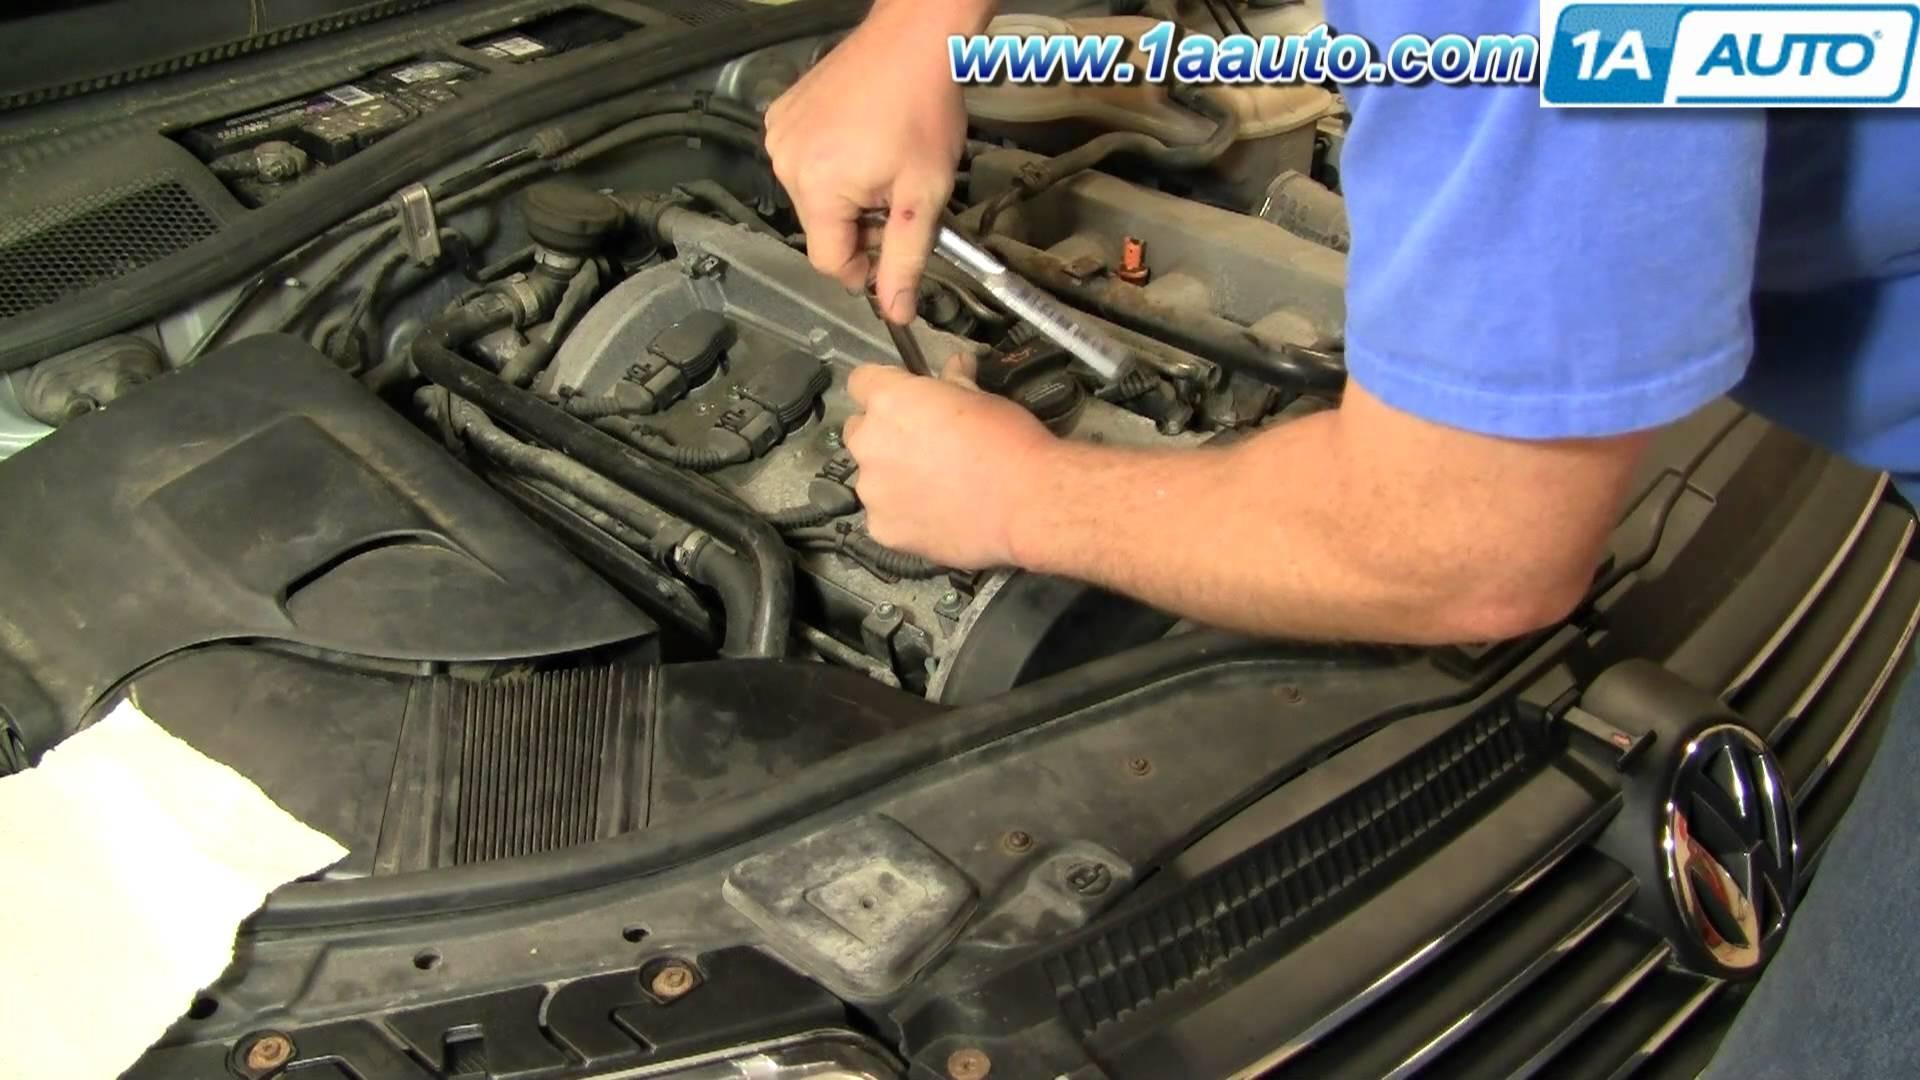 1999 Vw Passat Engine Diagram How to Install Replace Spark Plugs Volkswagen Passat 1 8t 1aauto Of 1999 Vw Passat Engine Diagram